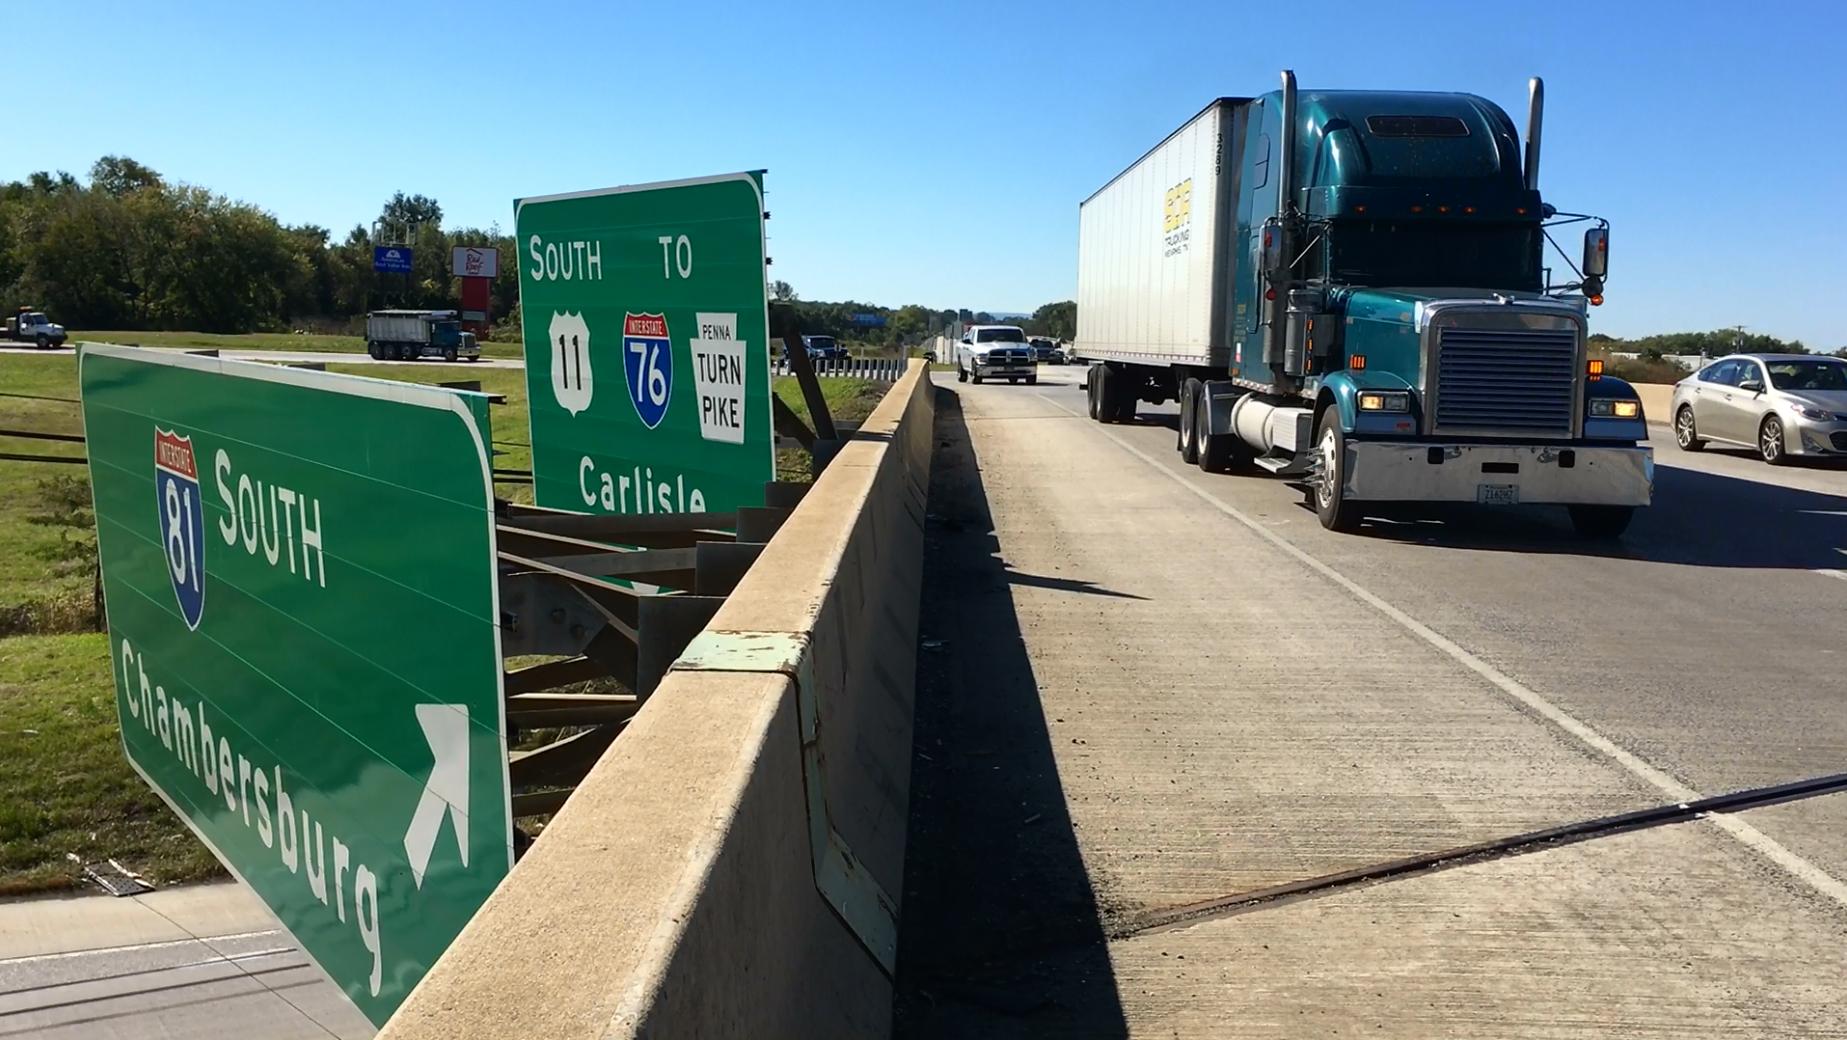 I-81 entrance ramp near Carlisle